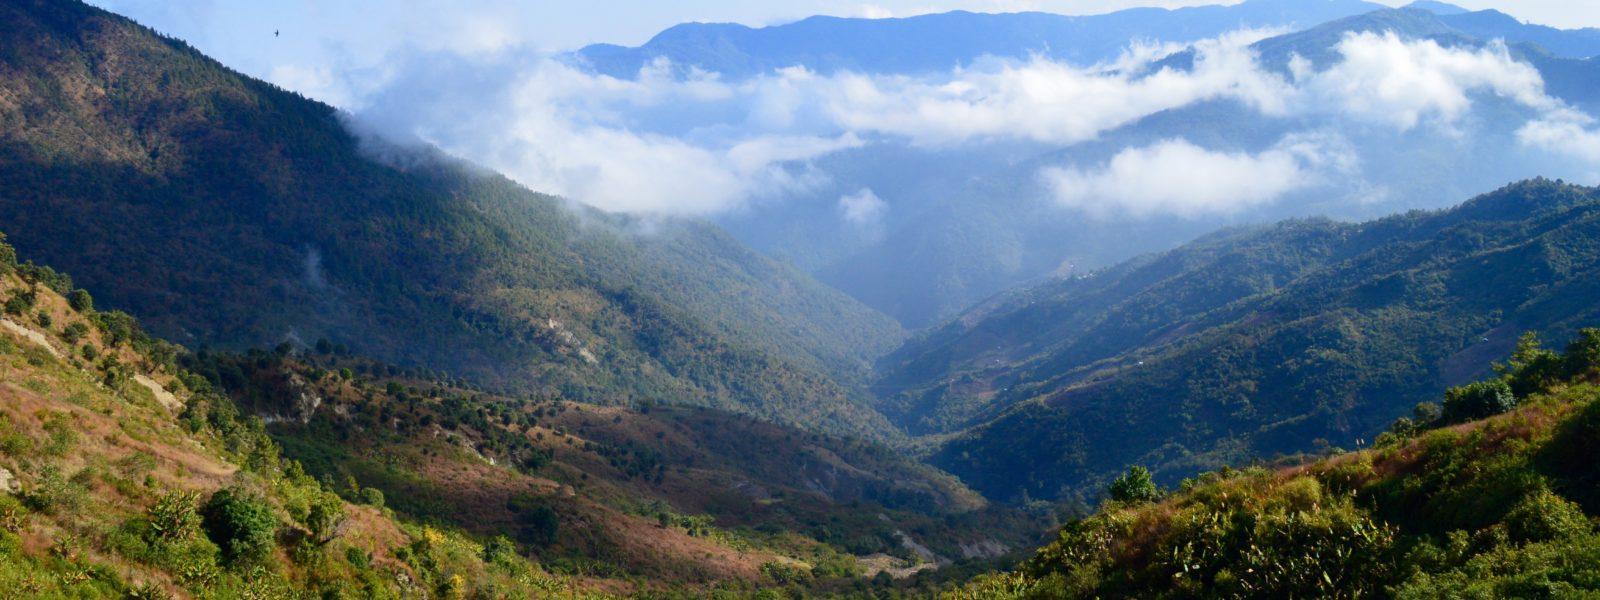 Chin State - Chin Hills - Myanmar - Sampan Travel